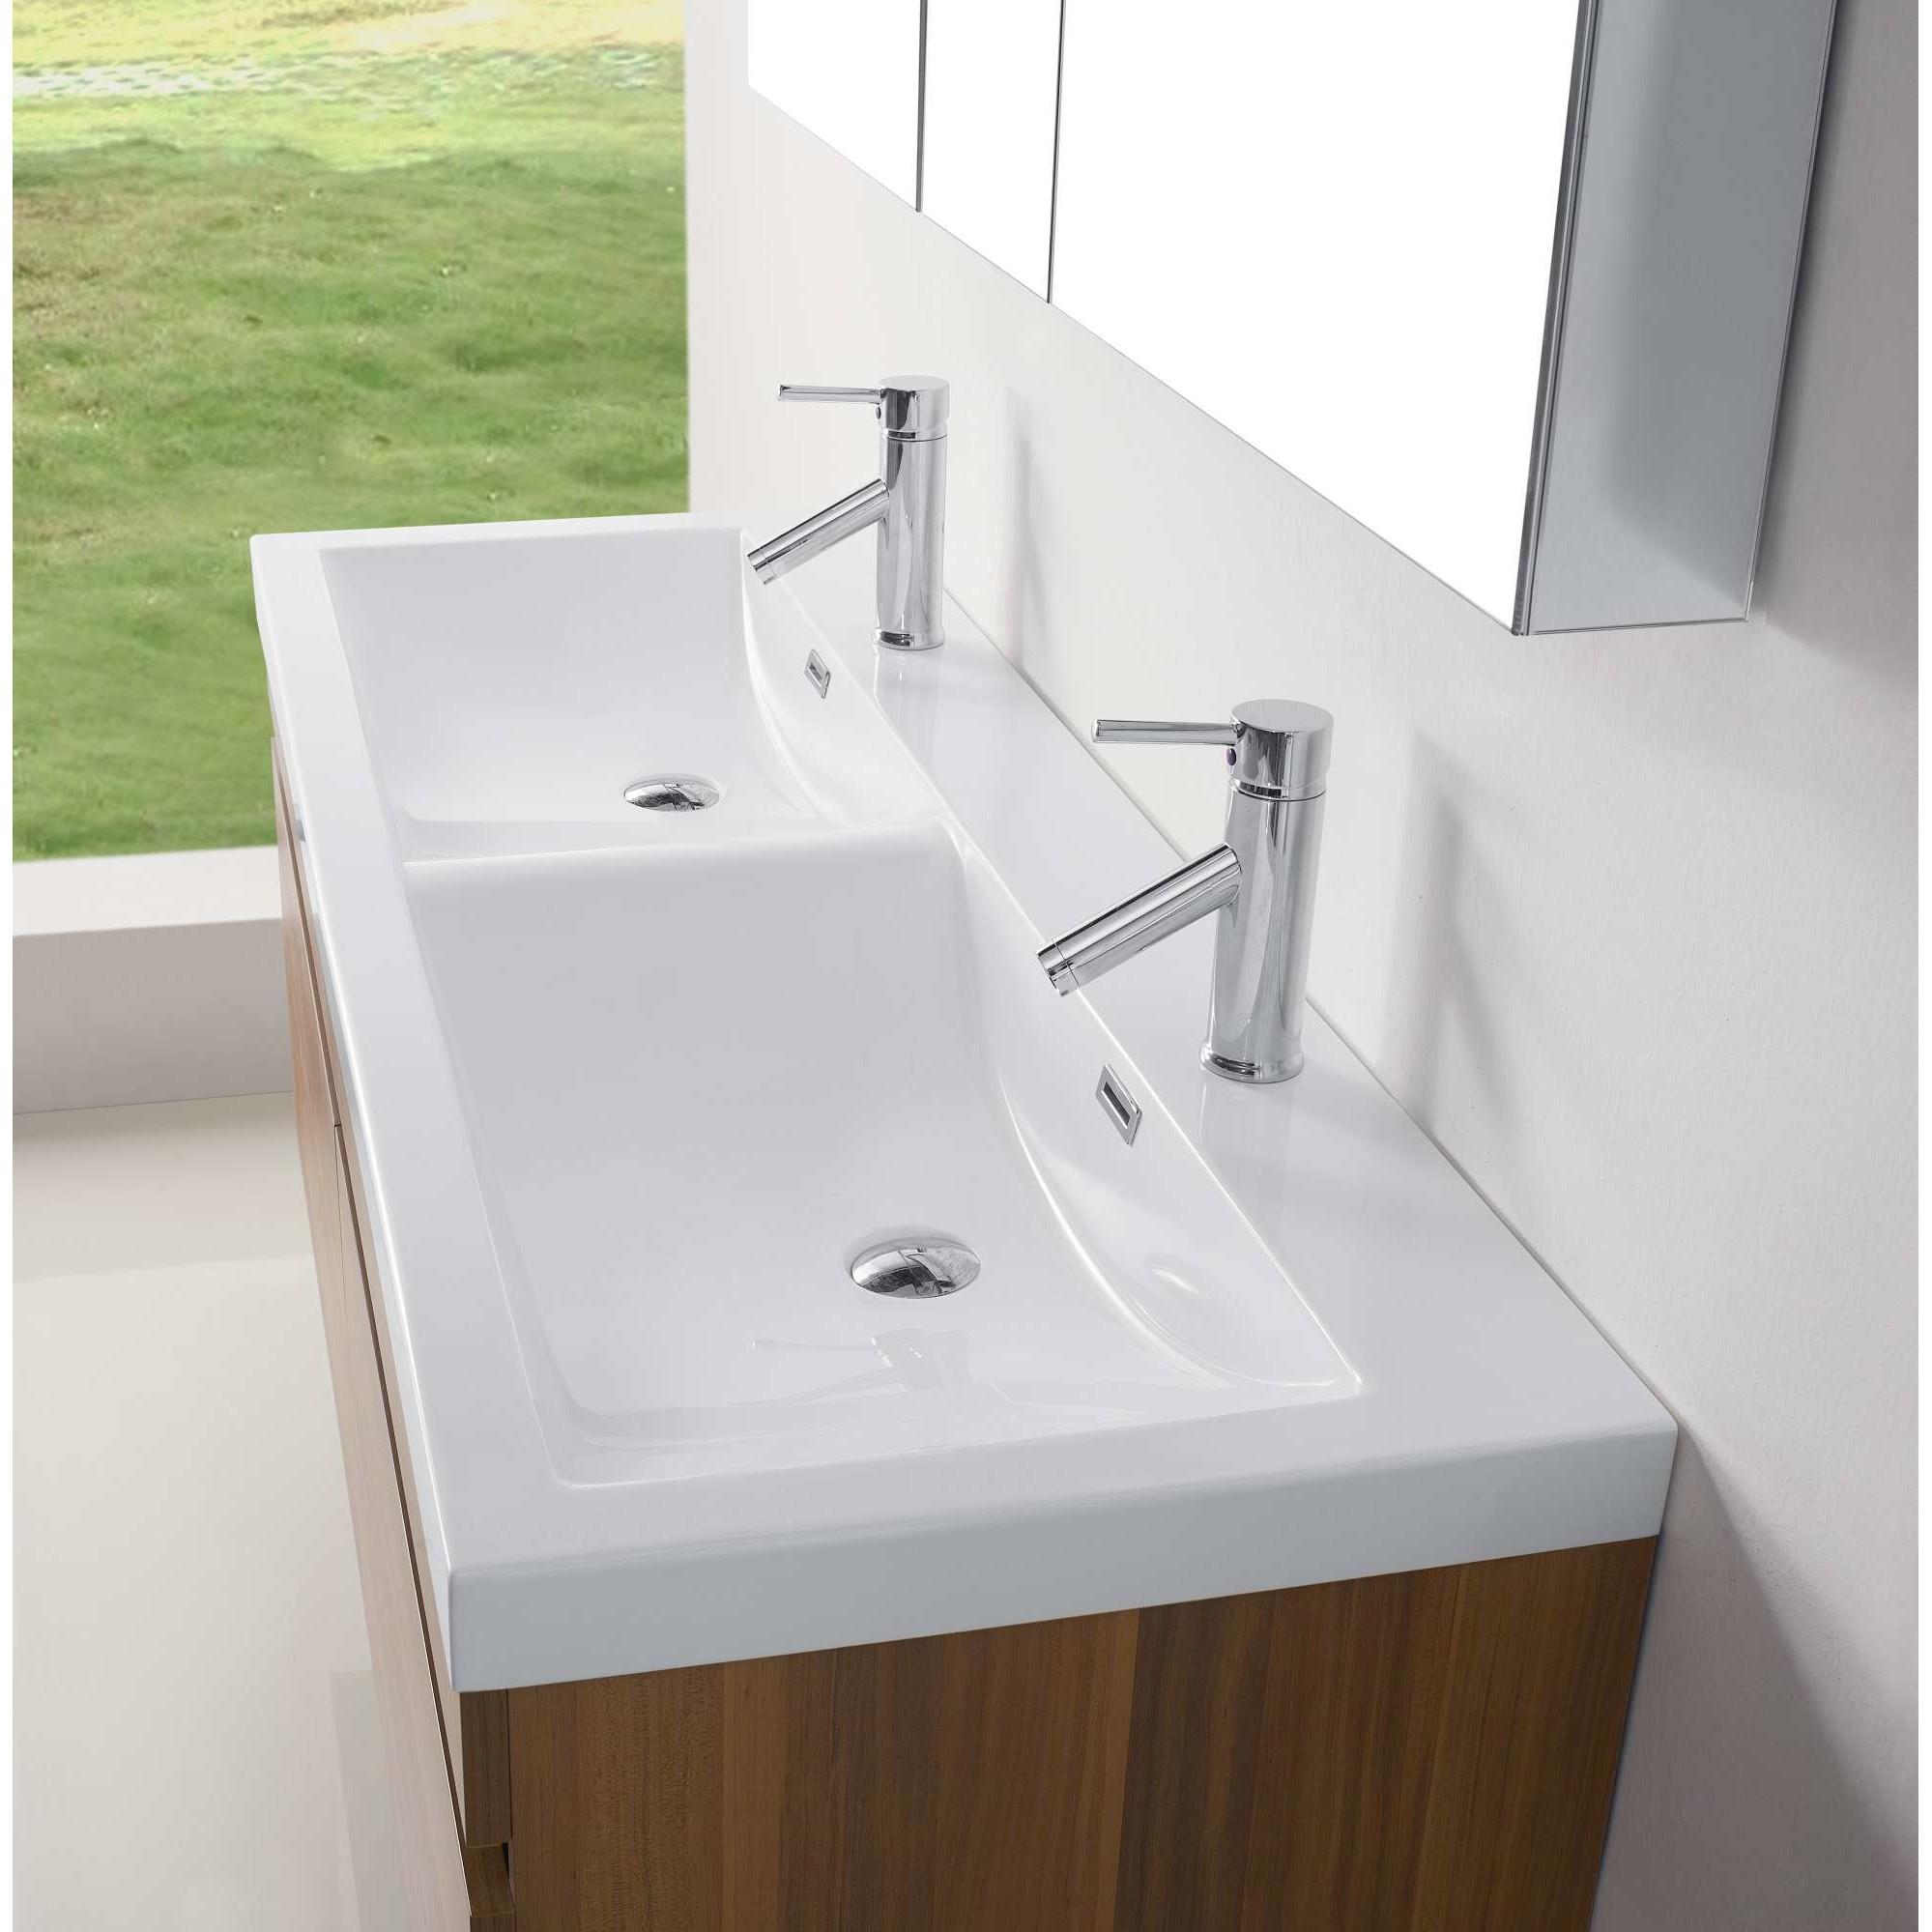 Fantastic Wayfair Bathroom Sinks Portrait - Bathroom Design Ideas ...